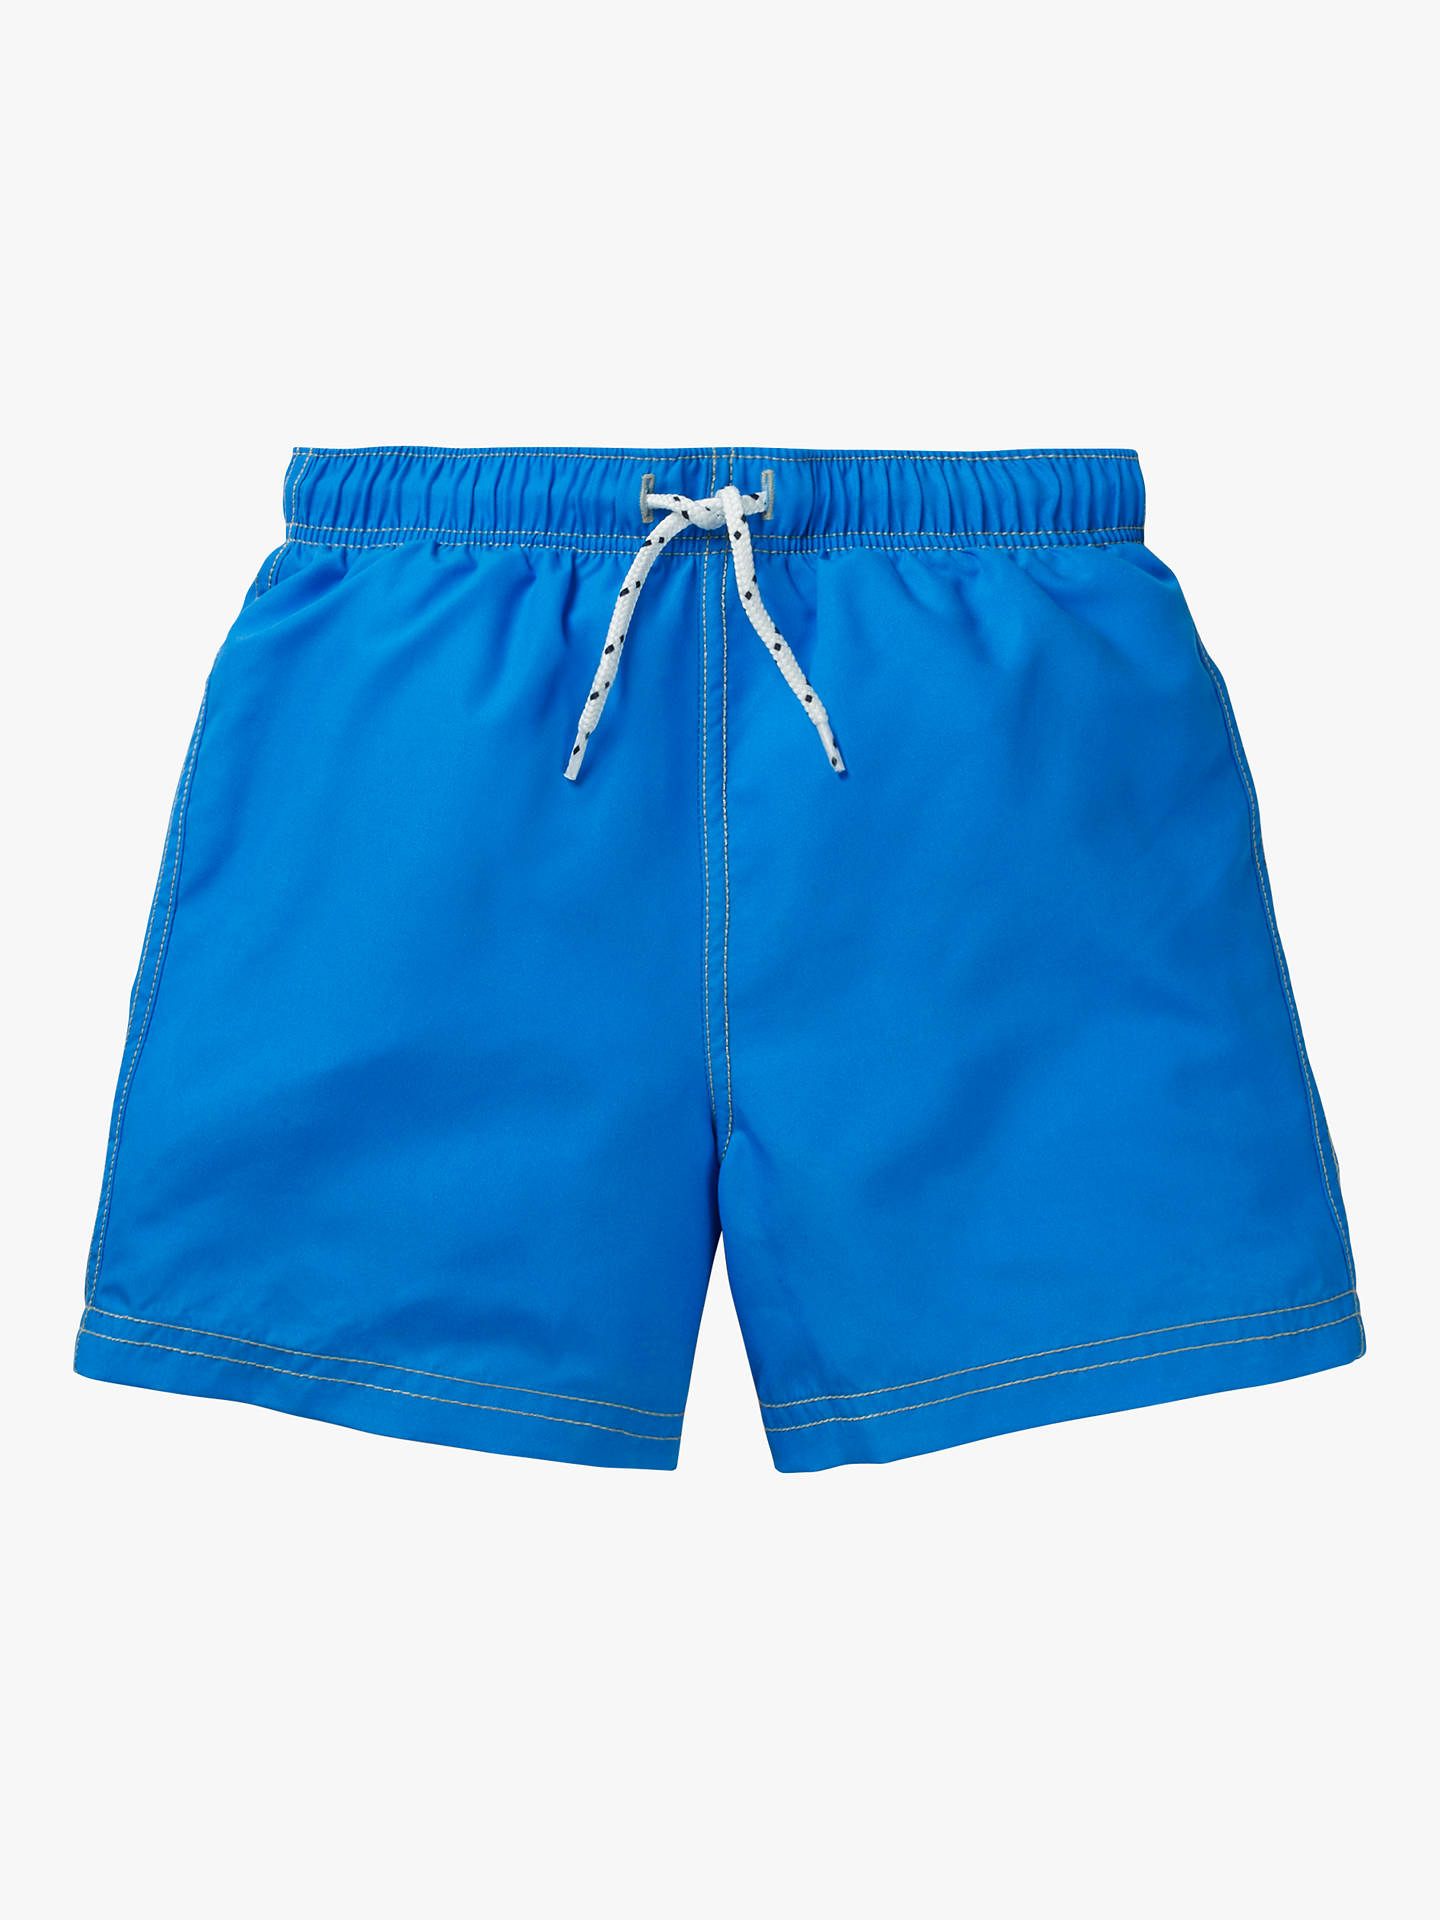 dfd9d05d74c1a ... Buy Mini Boden Boys' Bathers Swimming Shorts, Electric Blue Shark, 3-4  ...